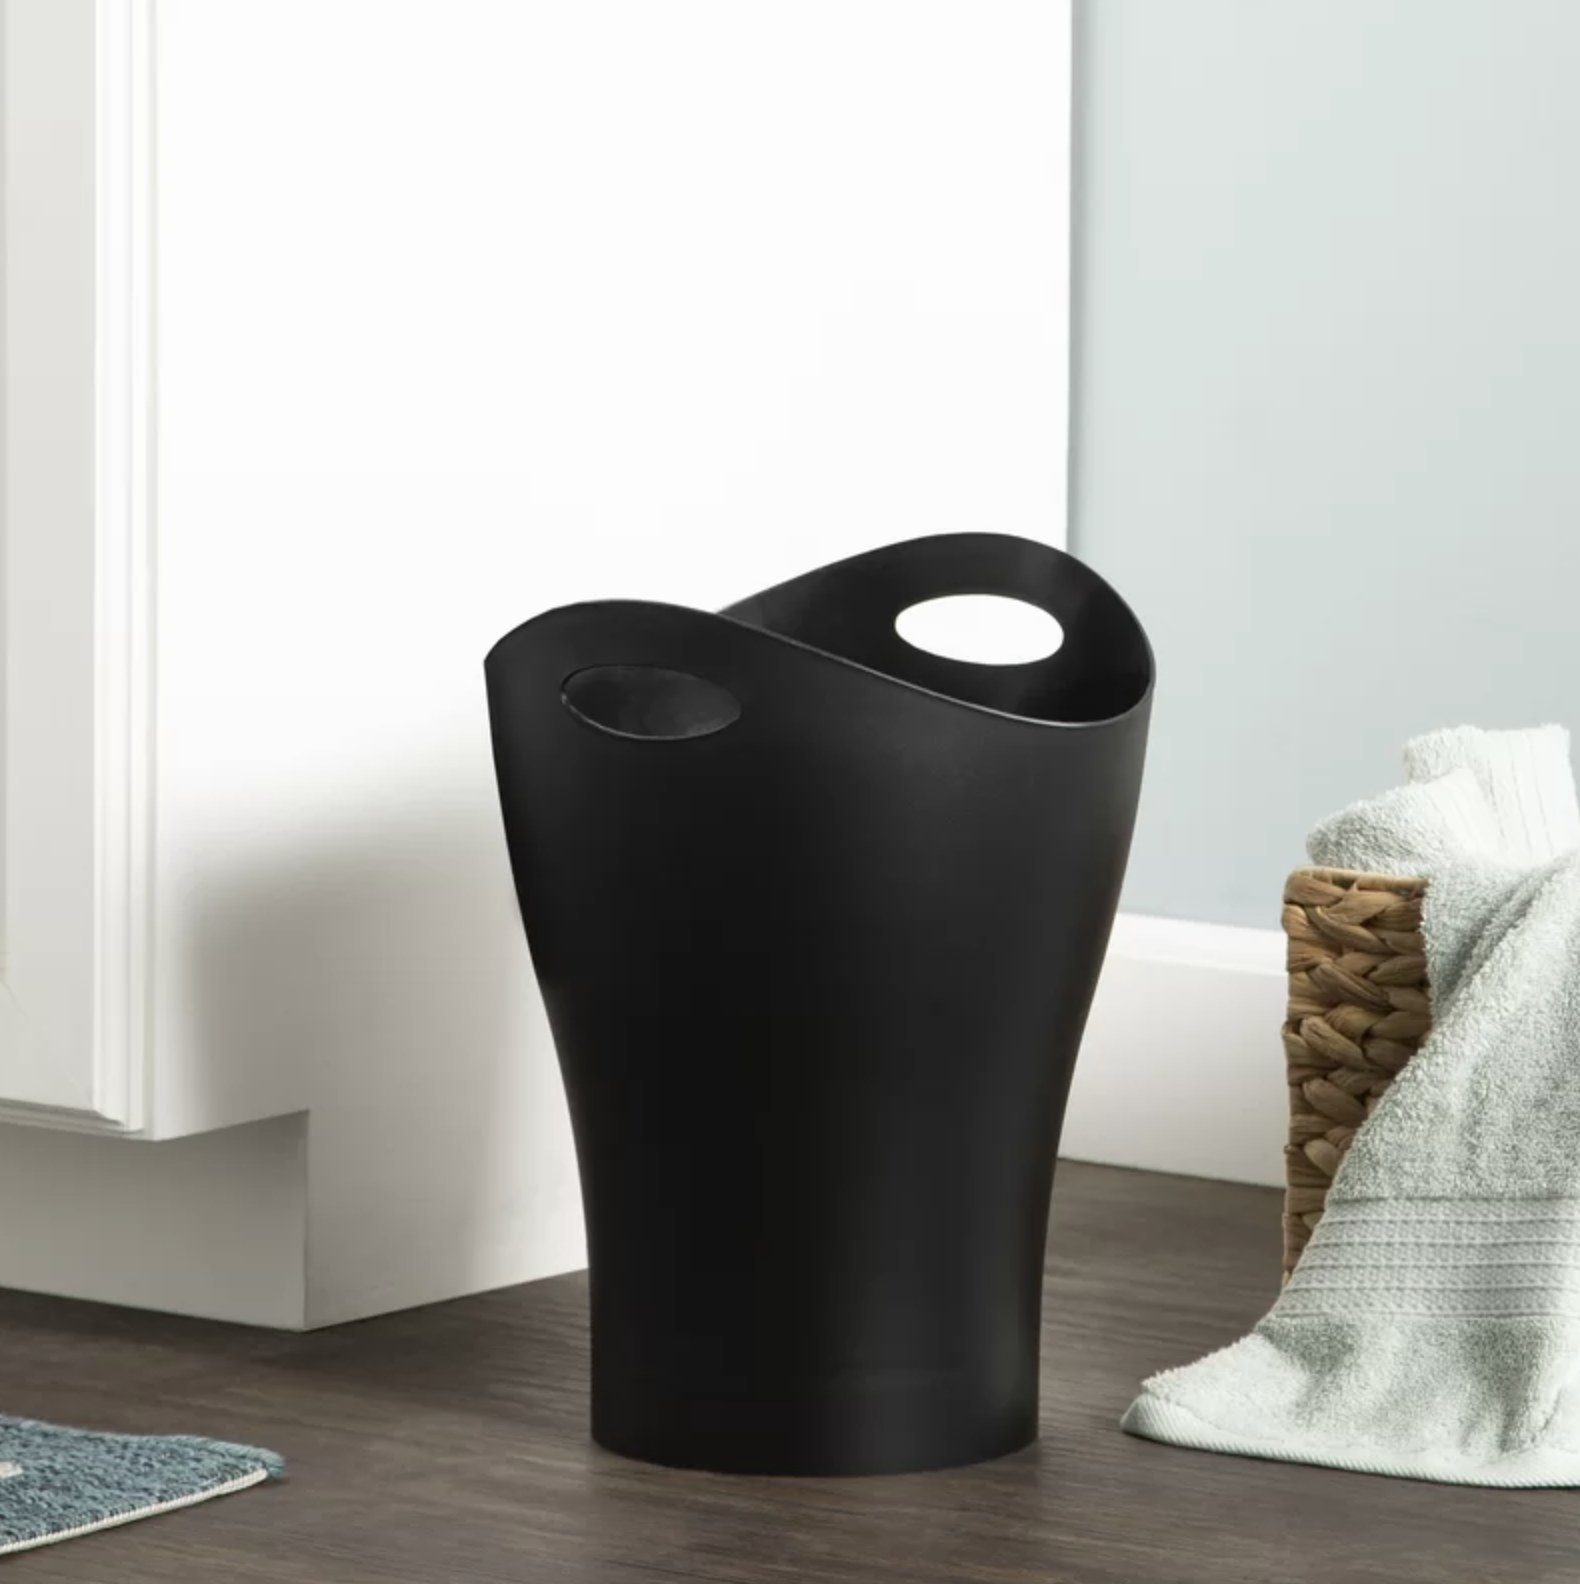 A black wastebasket